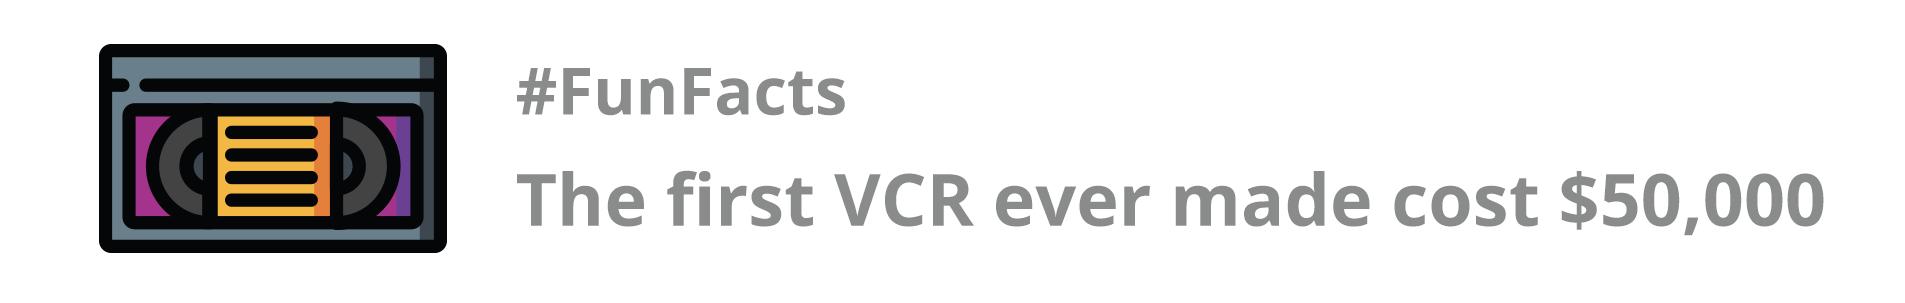 VCR Quote